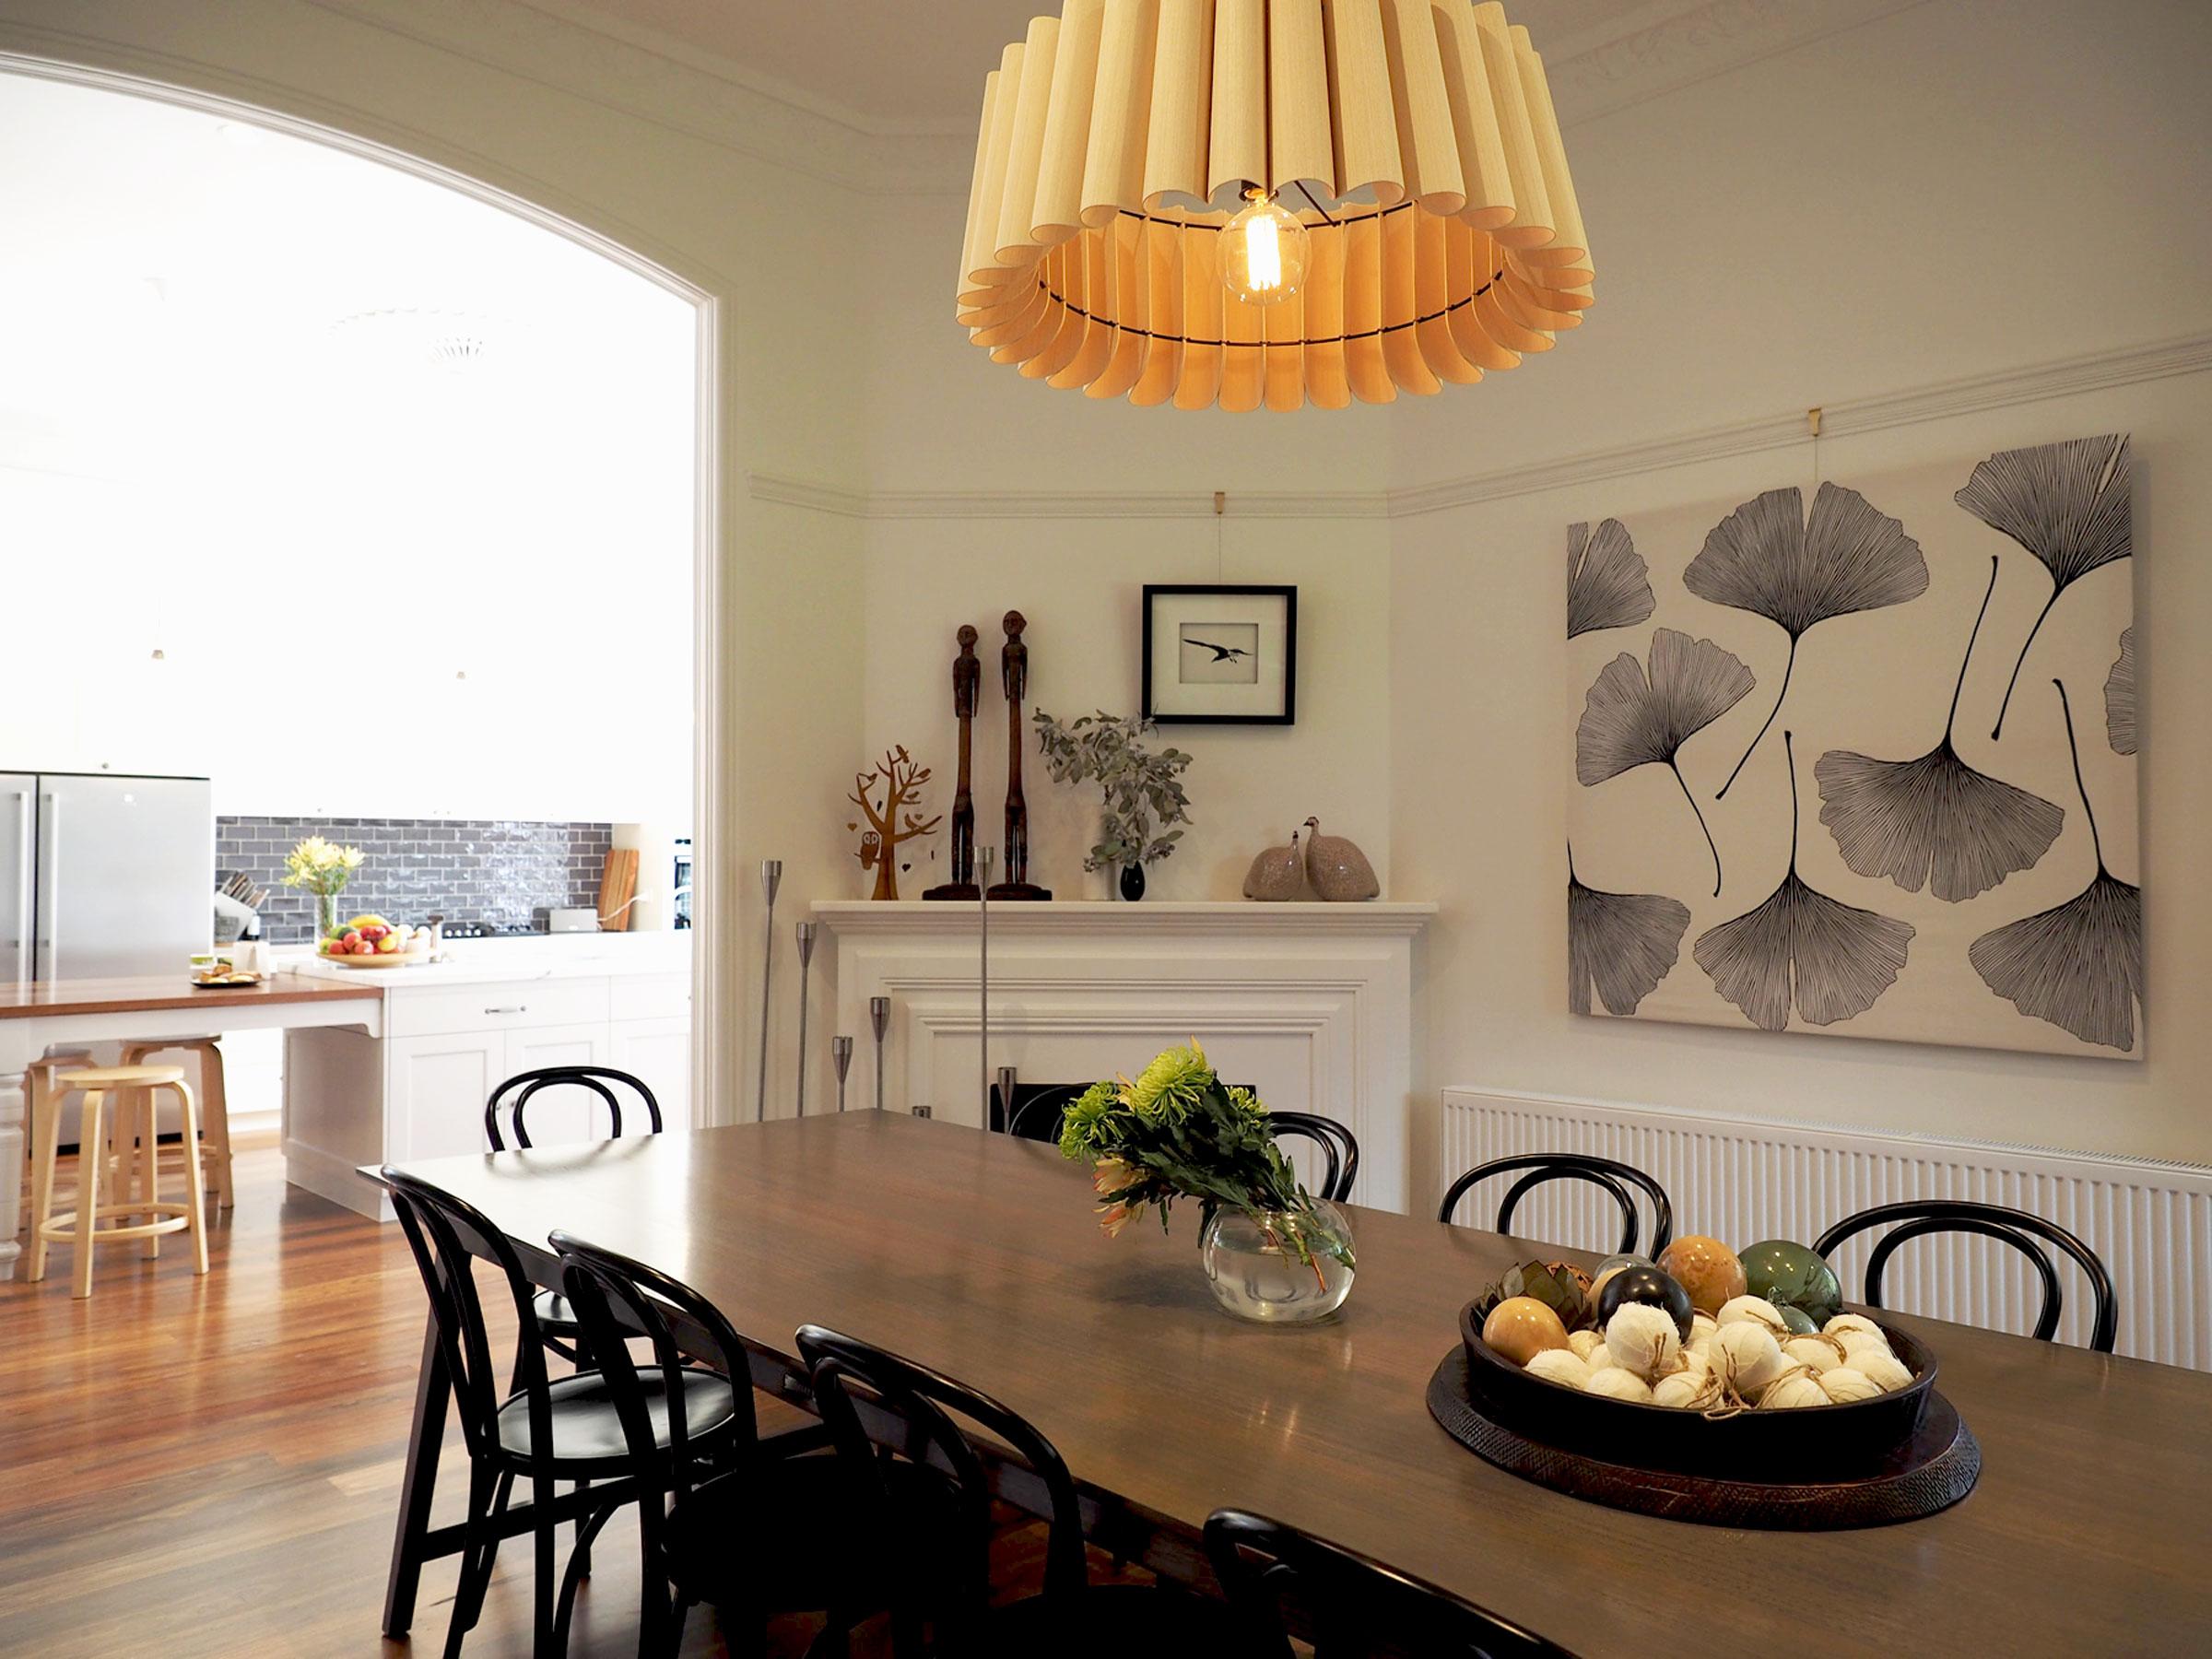 DINING-ROOM-WITH-WEP-LIGHT.jpg